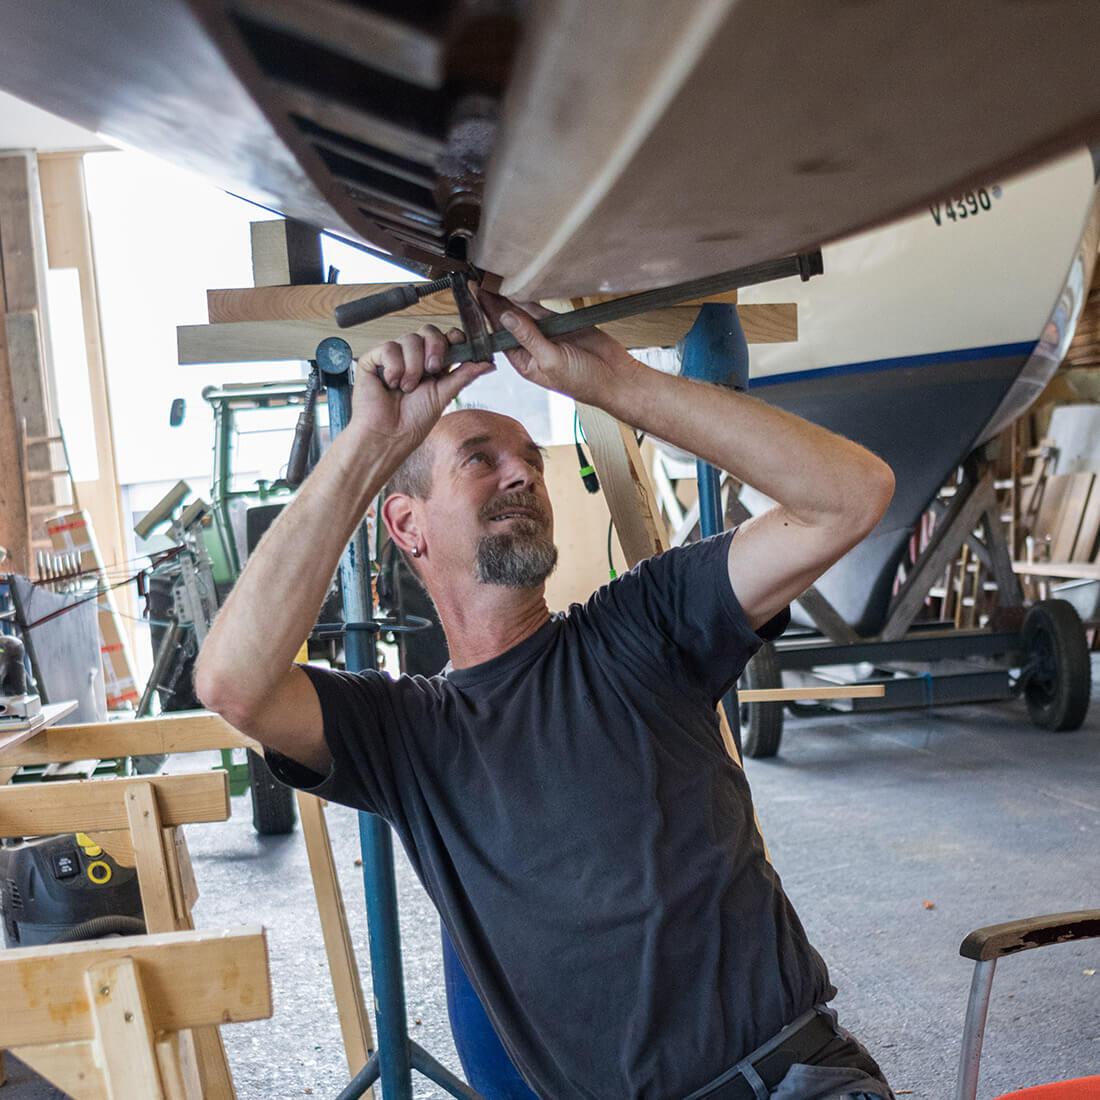 Reparaturarbeiten am Boot